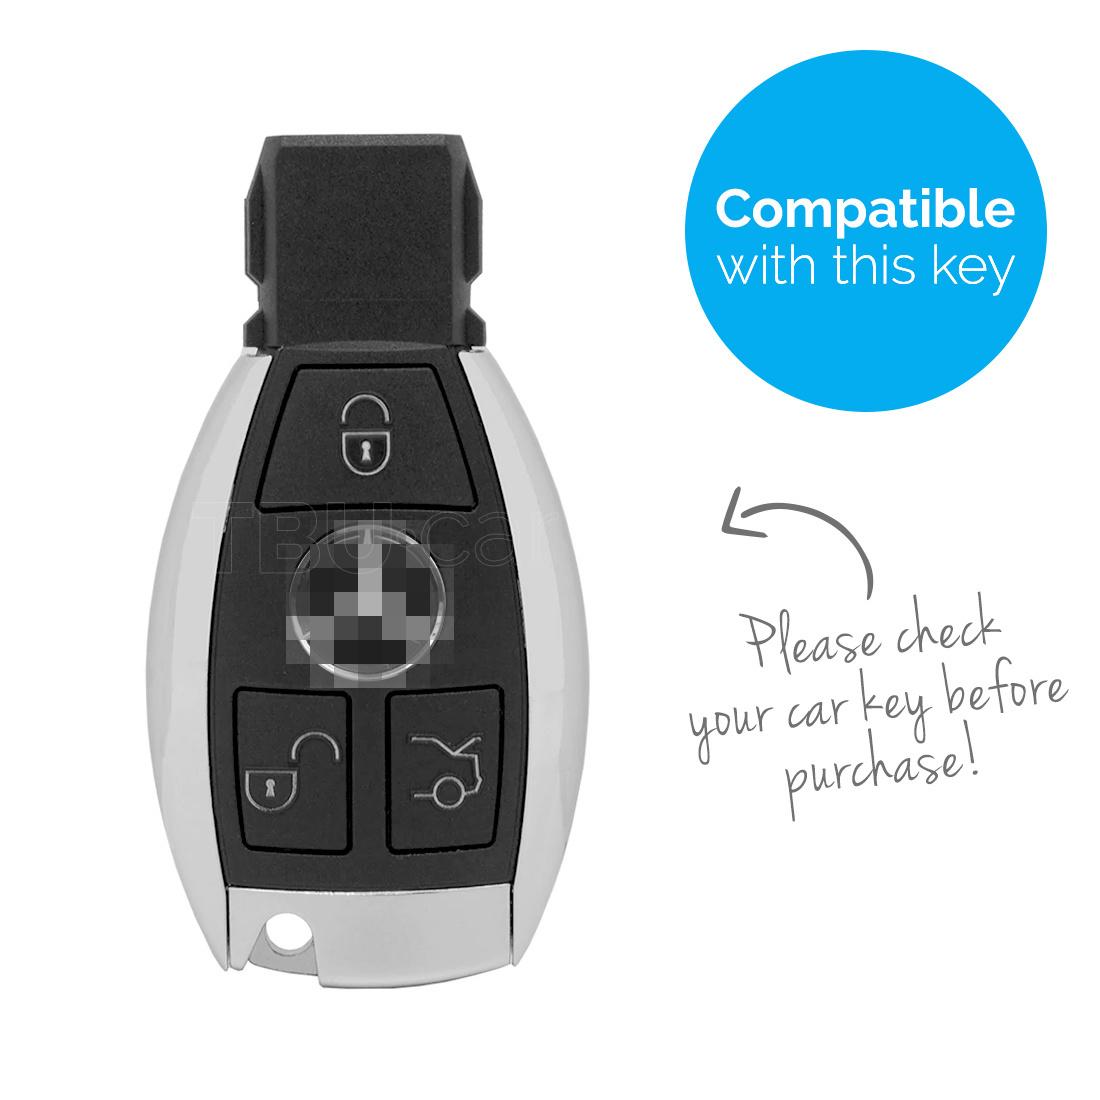 TBU car TBU car Autoschlüssel Hülle kompatibel mit Mercedes 3 Tasten - Schutzhülle aus TPU - Auto Schlüsselhülle Cover in Roségold